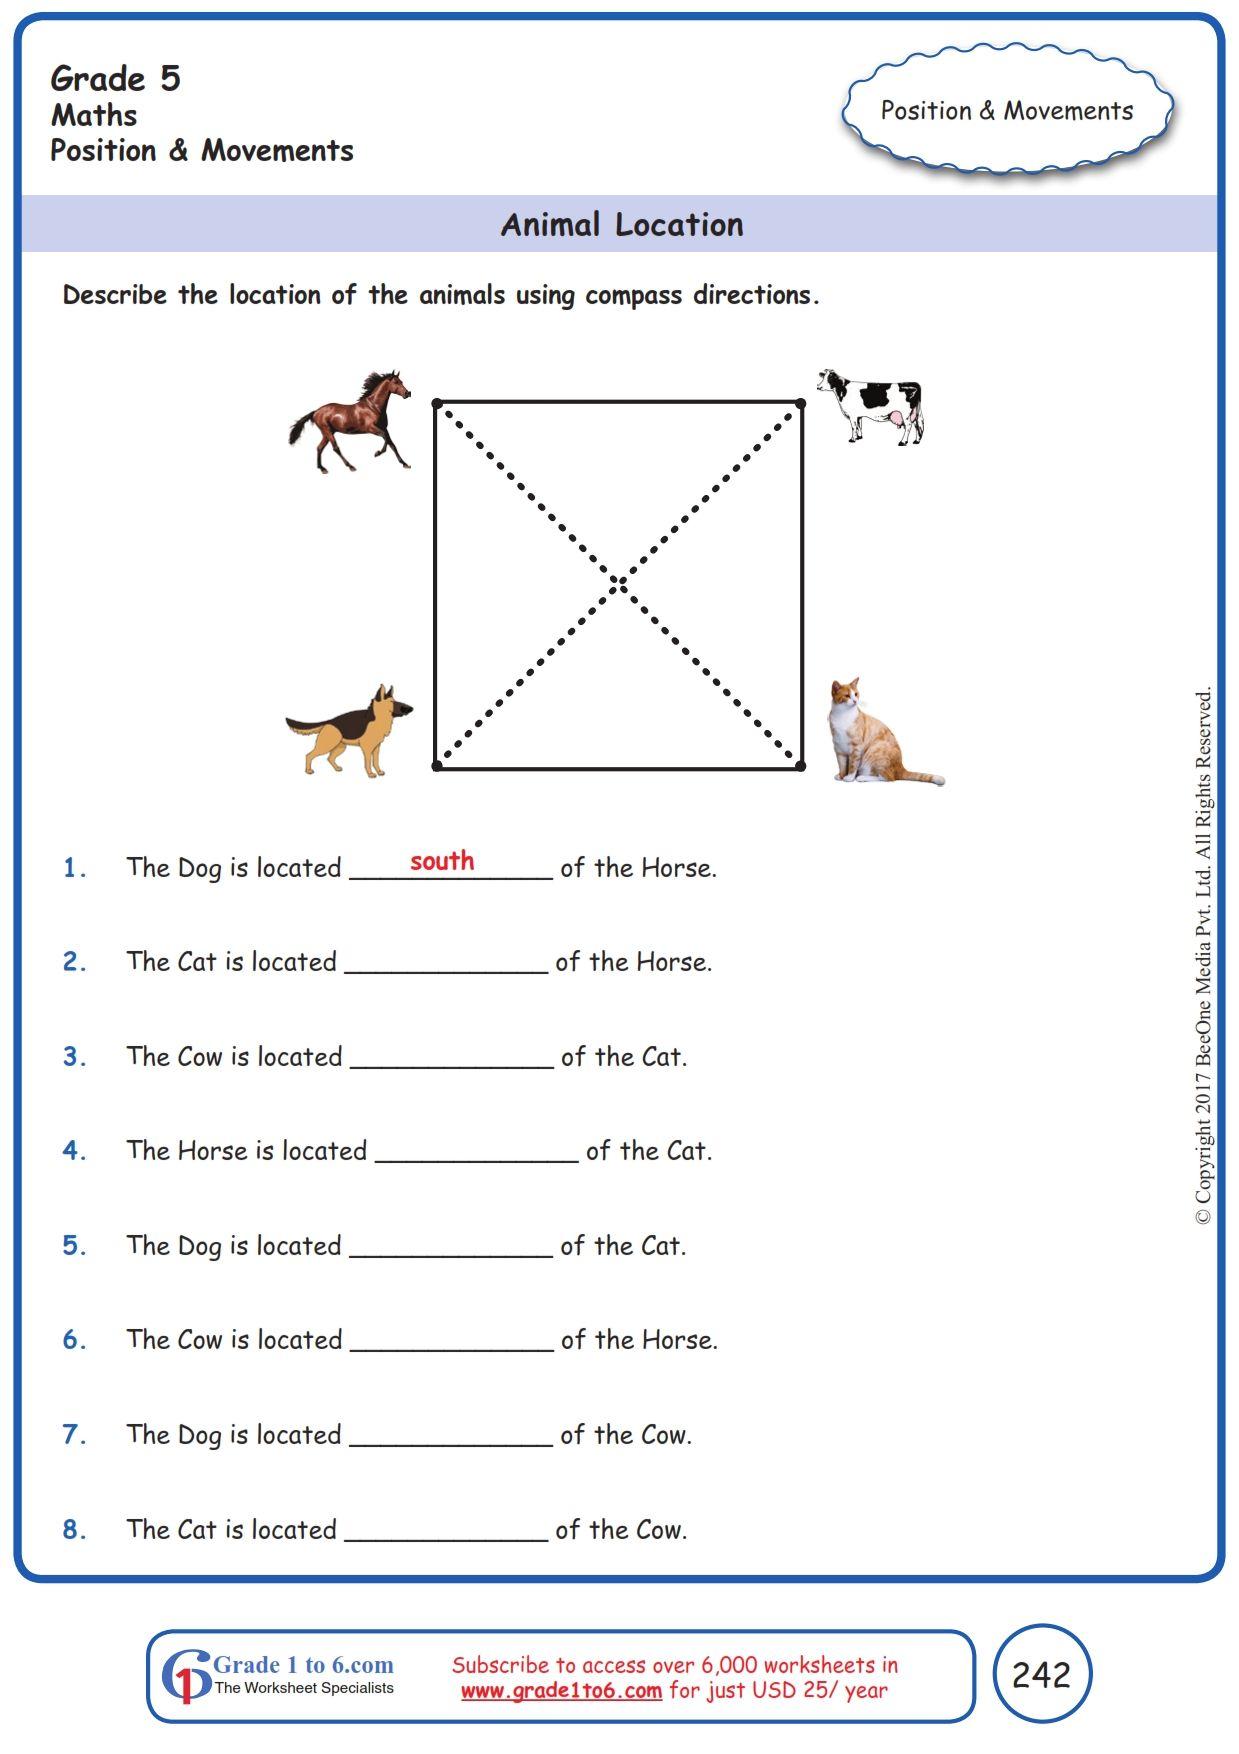 hight resolution of Worksheet Grade 5 Math Animal Location   Grade 5 math worksheets